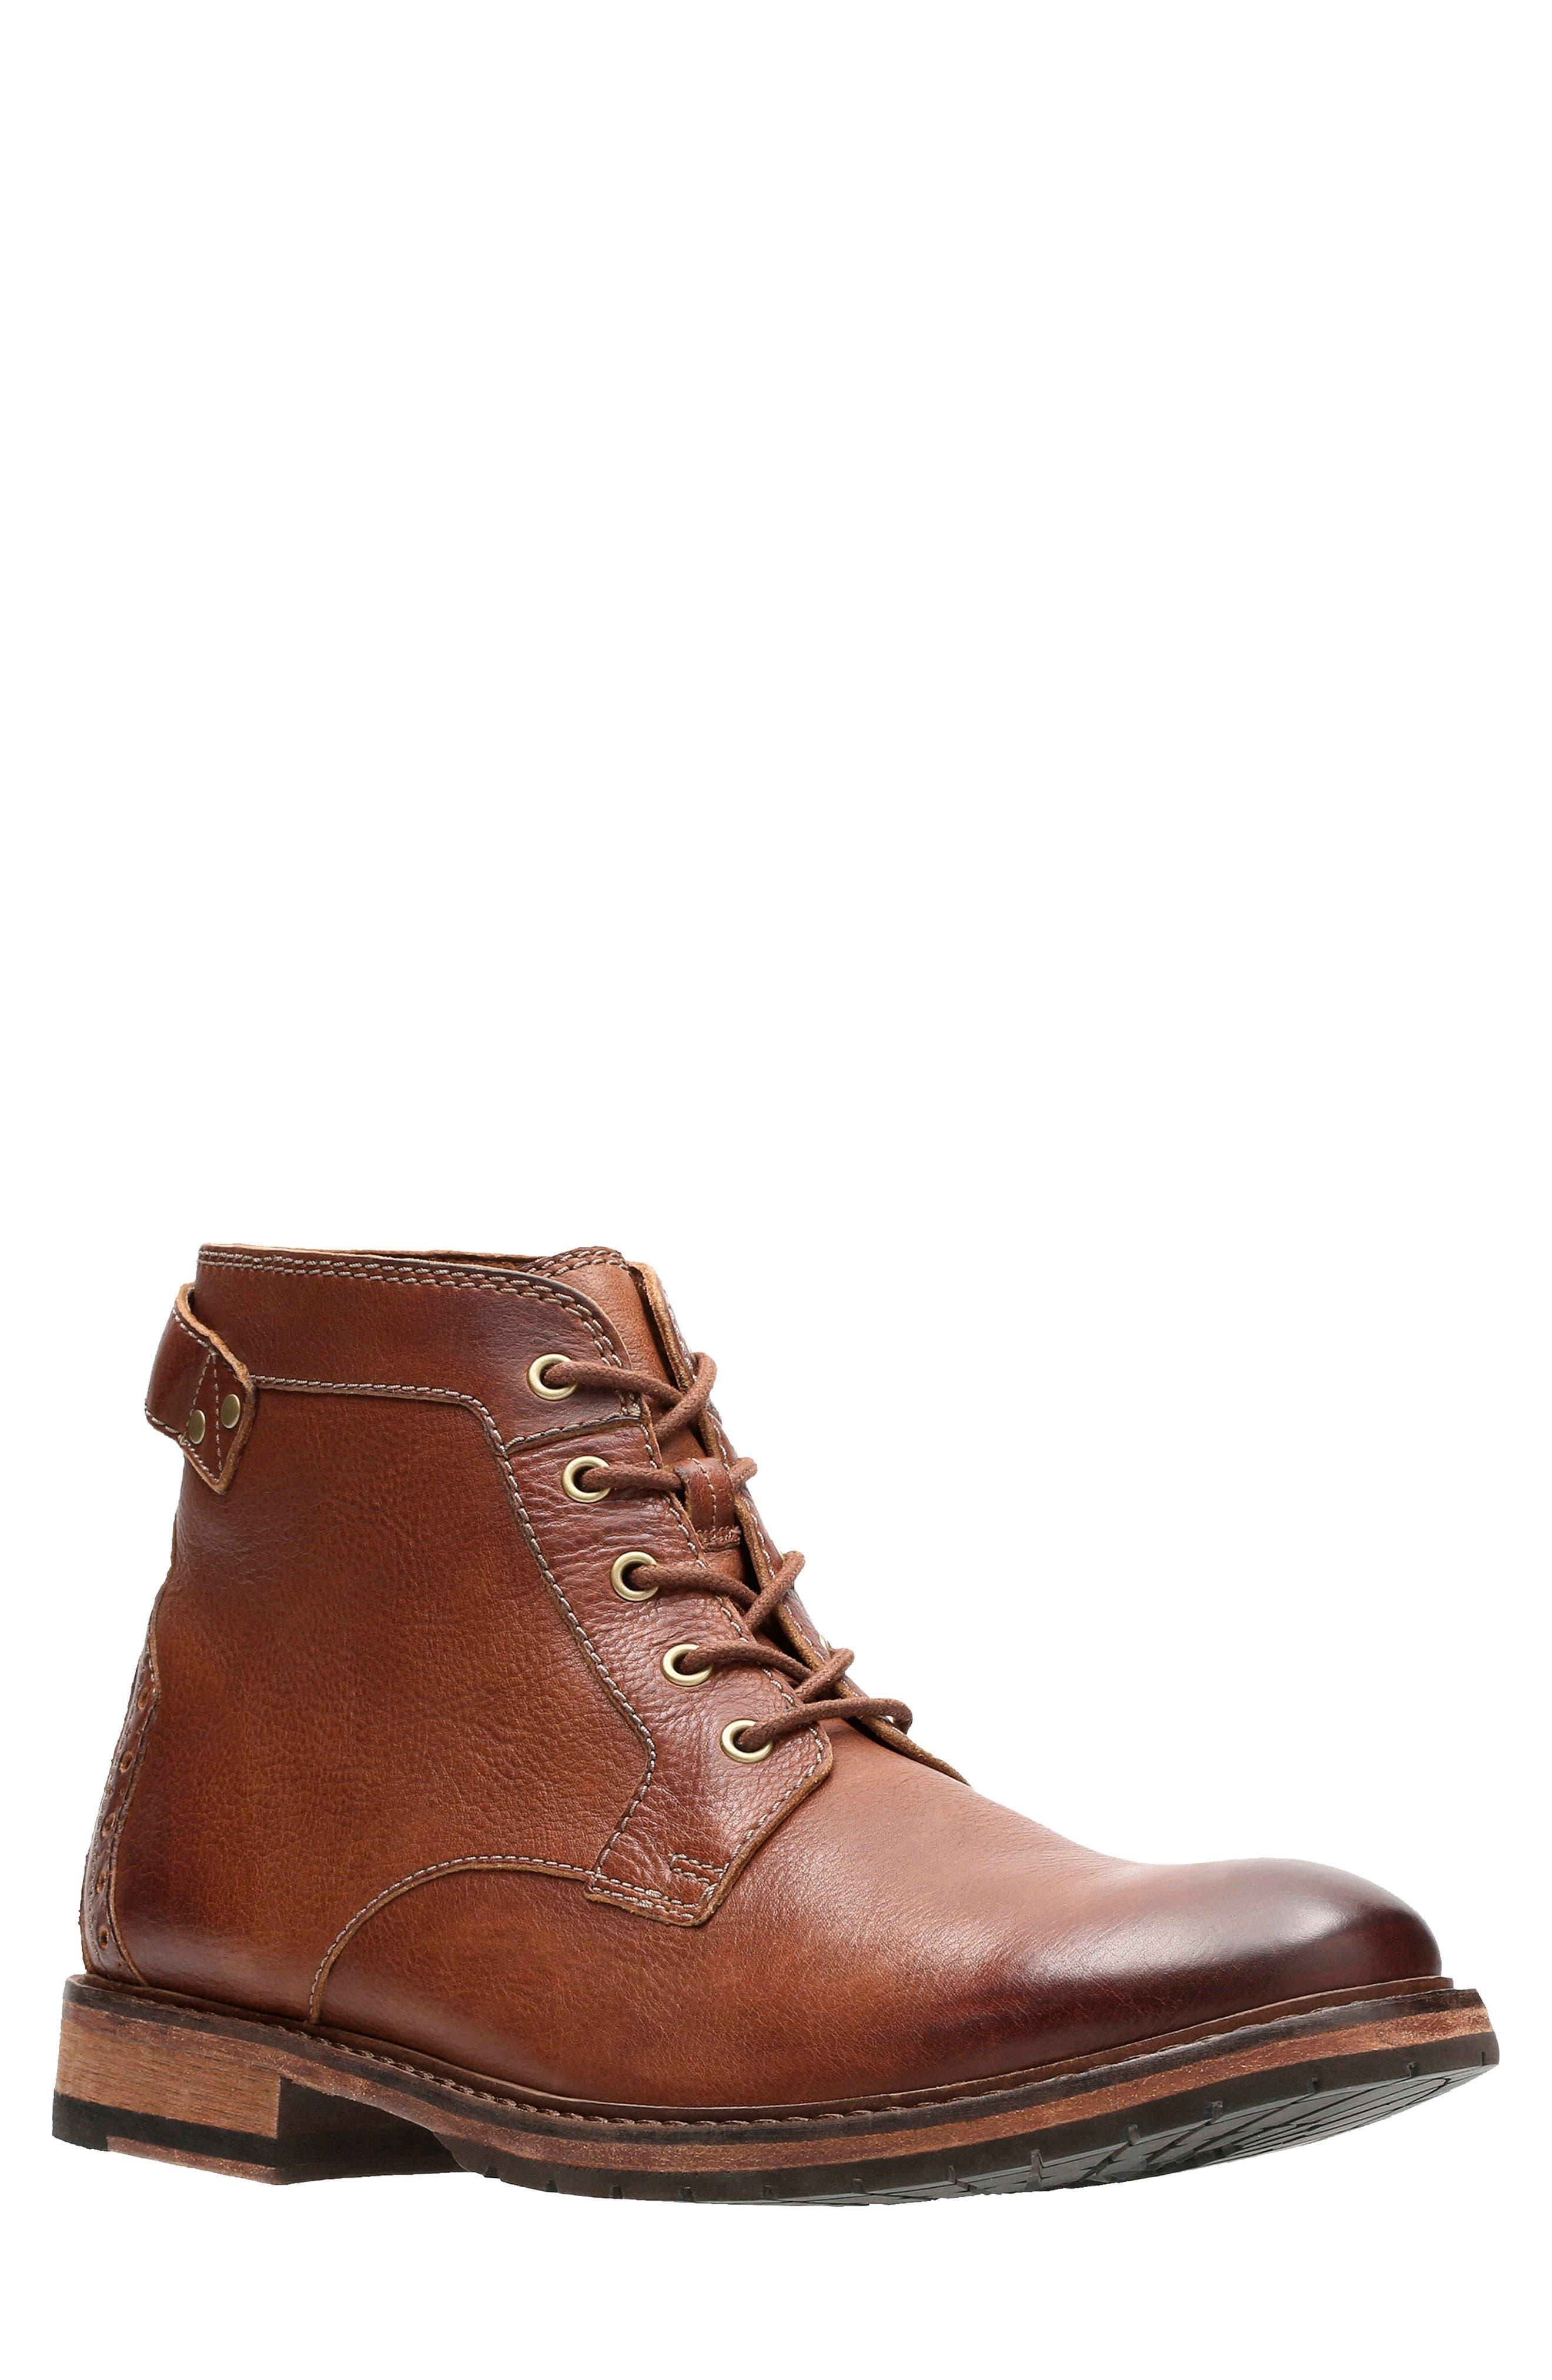 Clarkdale Bud Plain Toe Boot,                             Main thumbnail 1, color,                             DARK TAN LEATHER